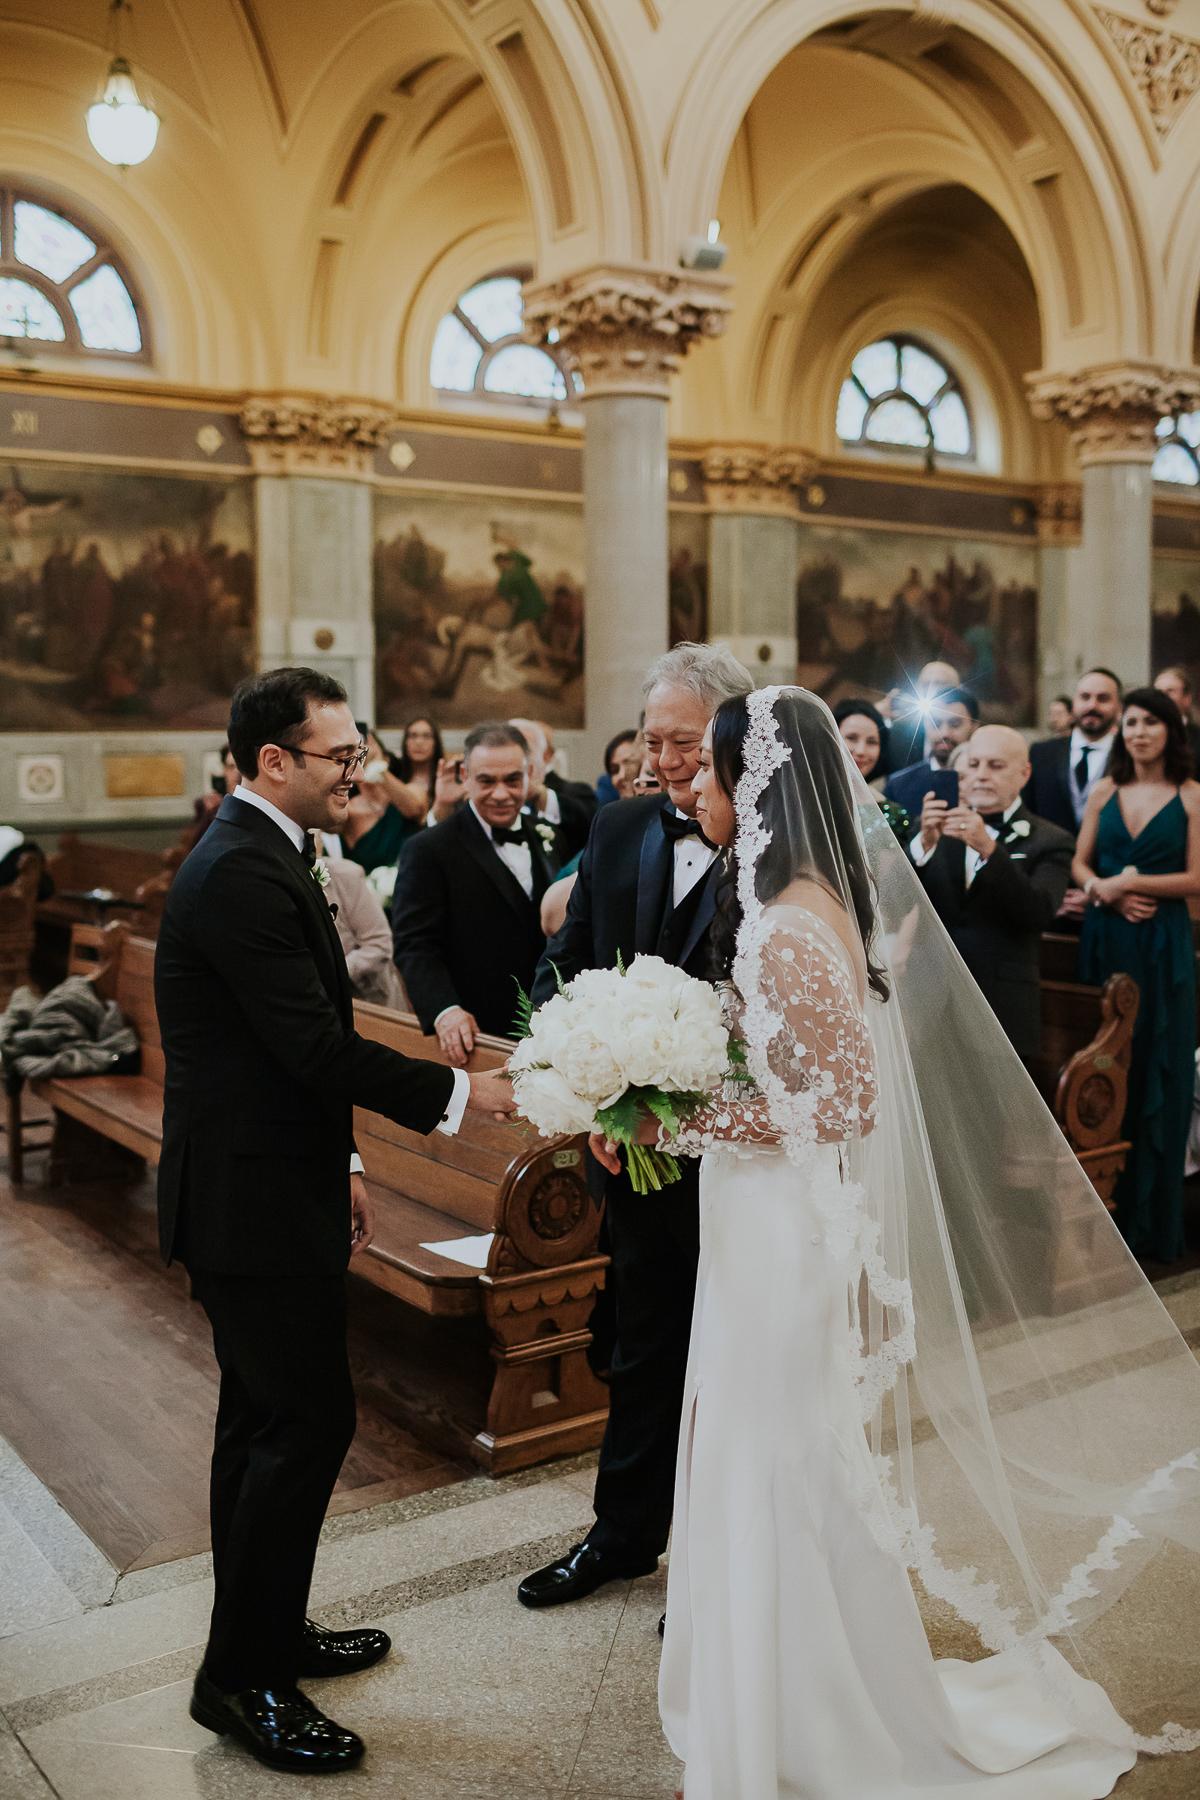 Bowery-Hotel-NYC-Documentary-Wedding-Photos-31.jpg